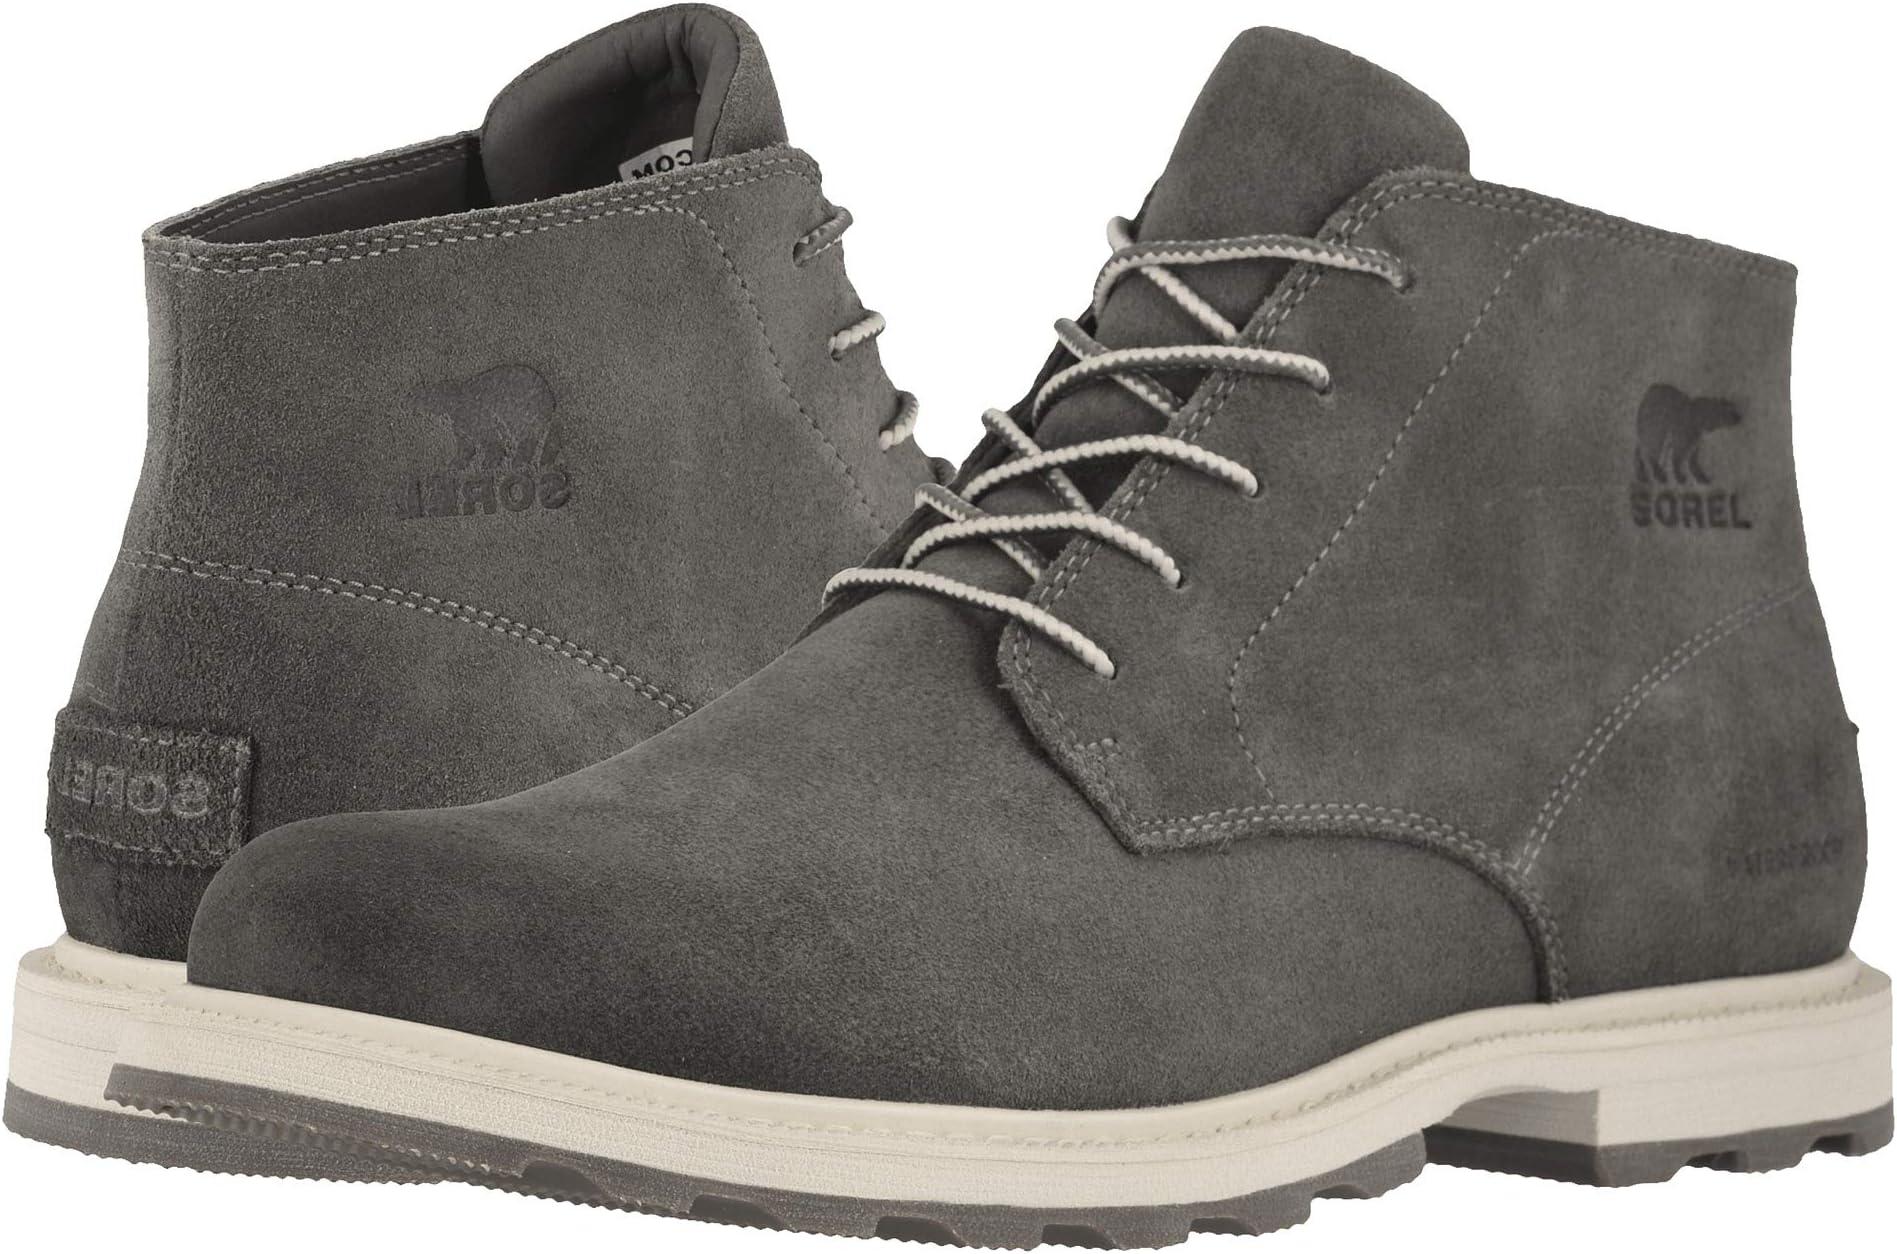 Sorel Men's Shoes